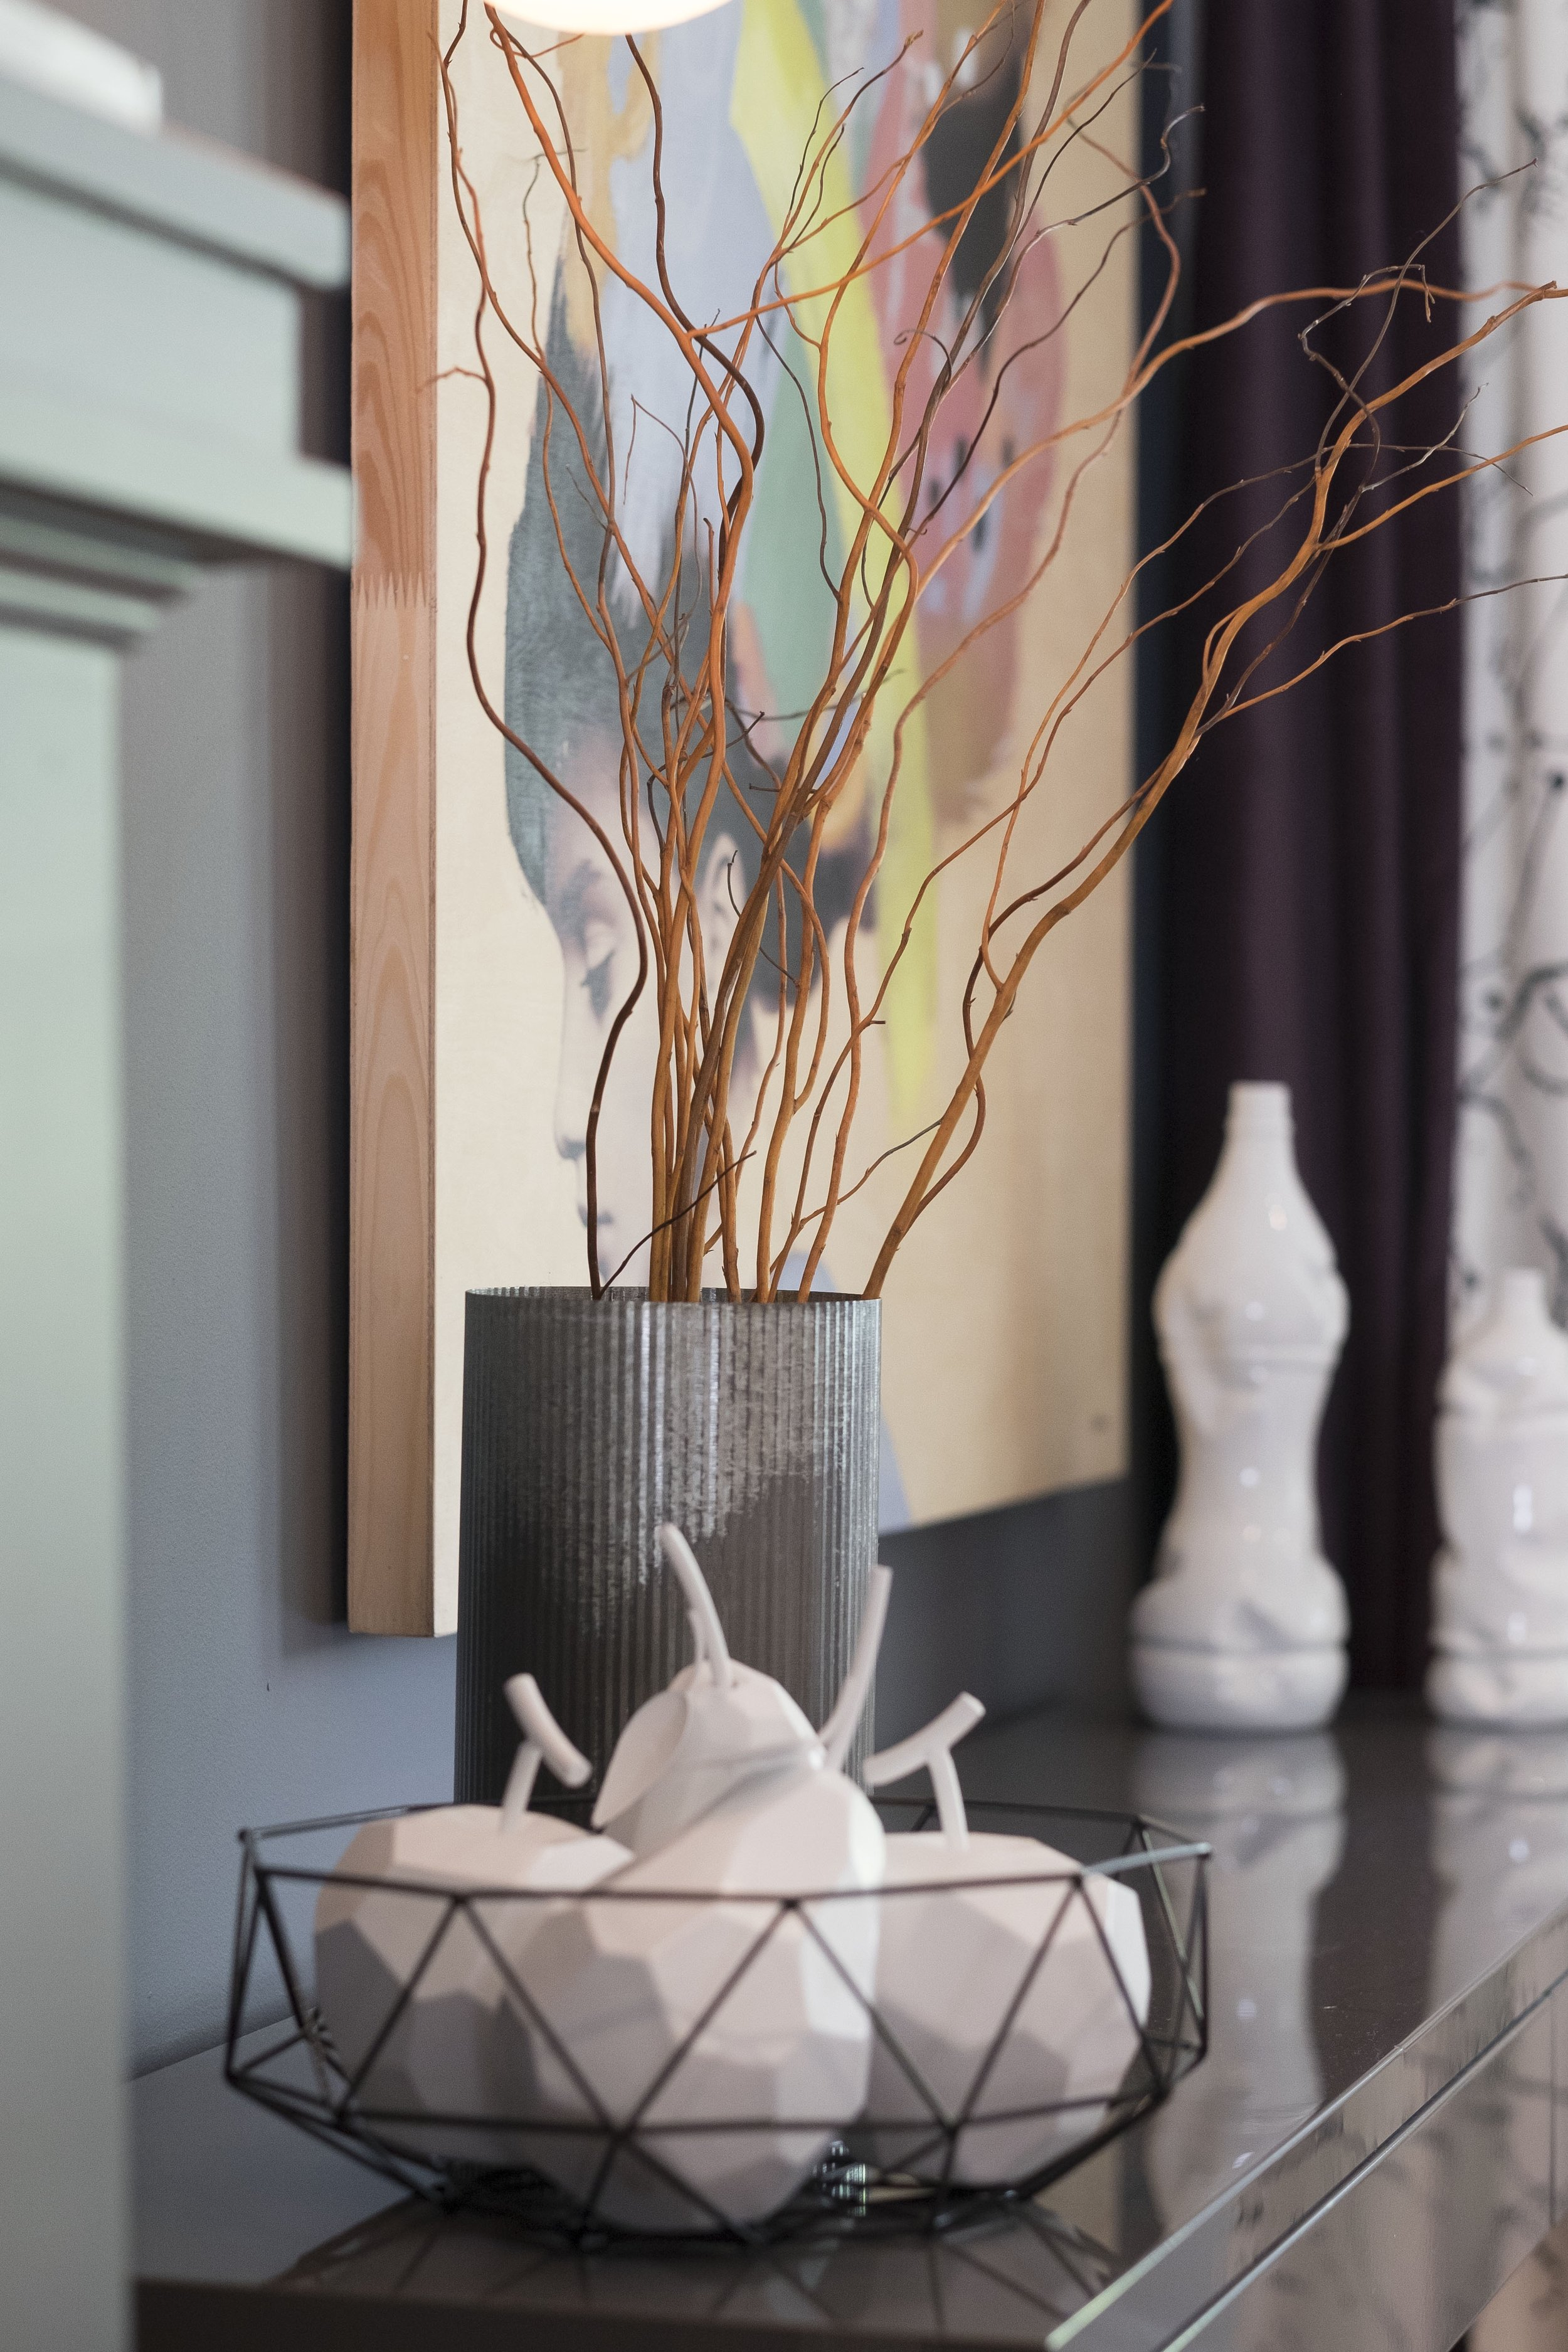 wire-home-decor-basket